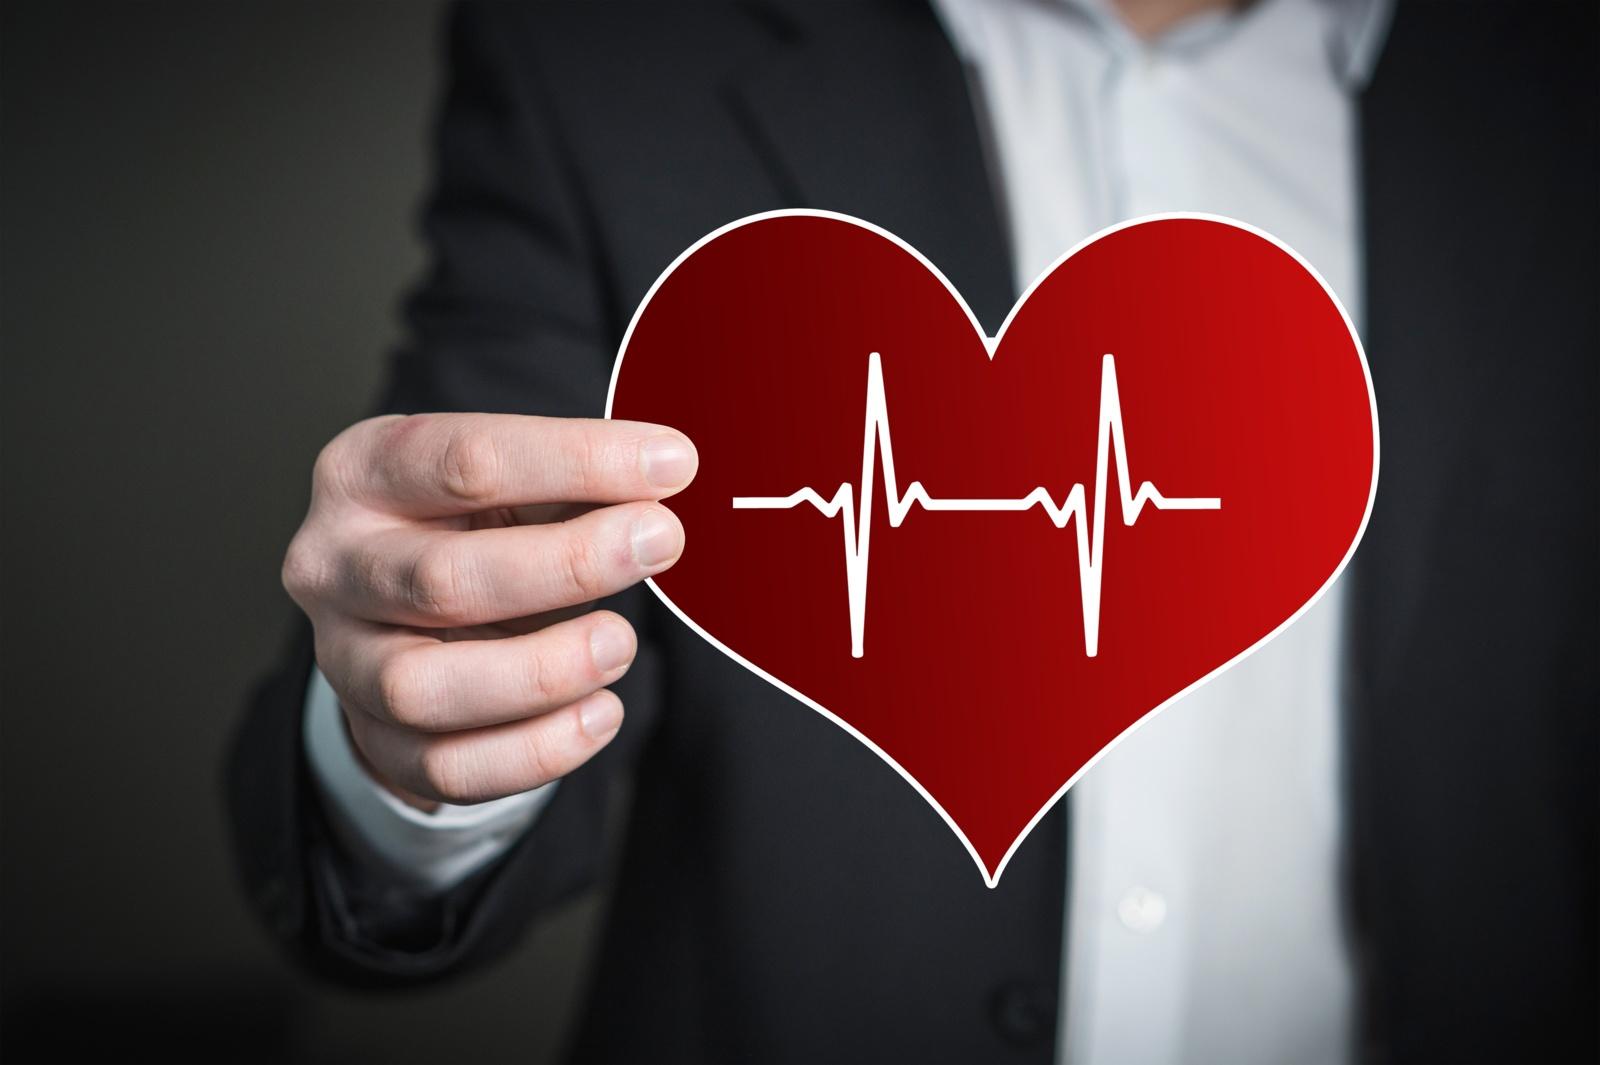 sveikatos, nei gydant hipertenziją